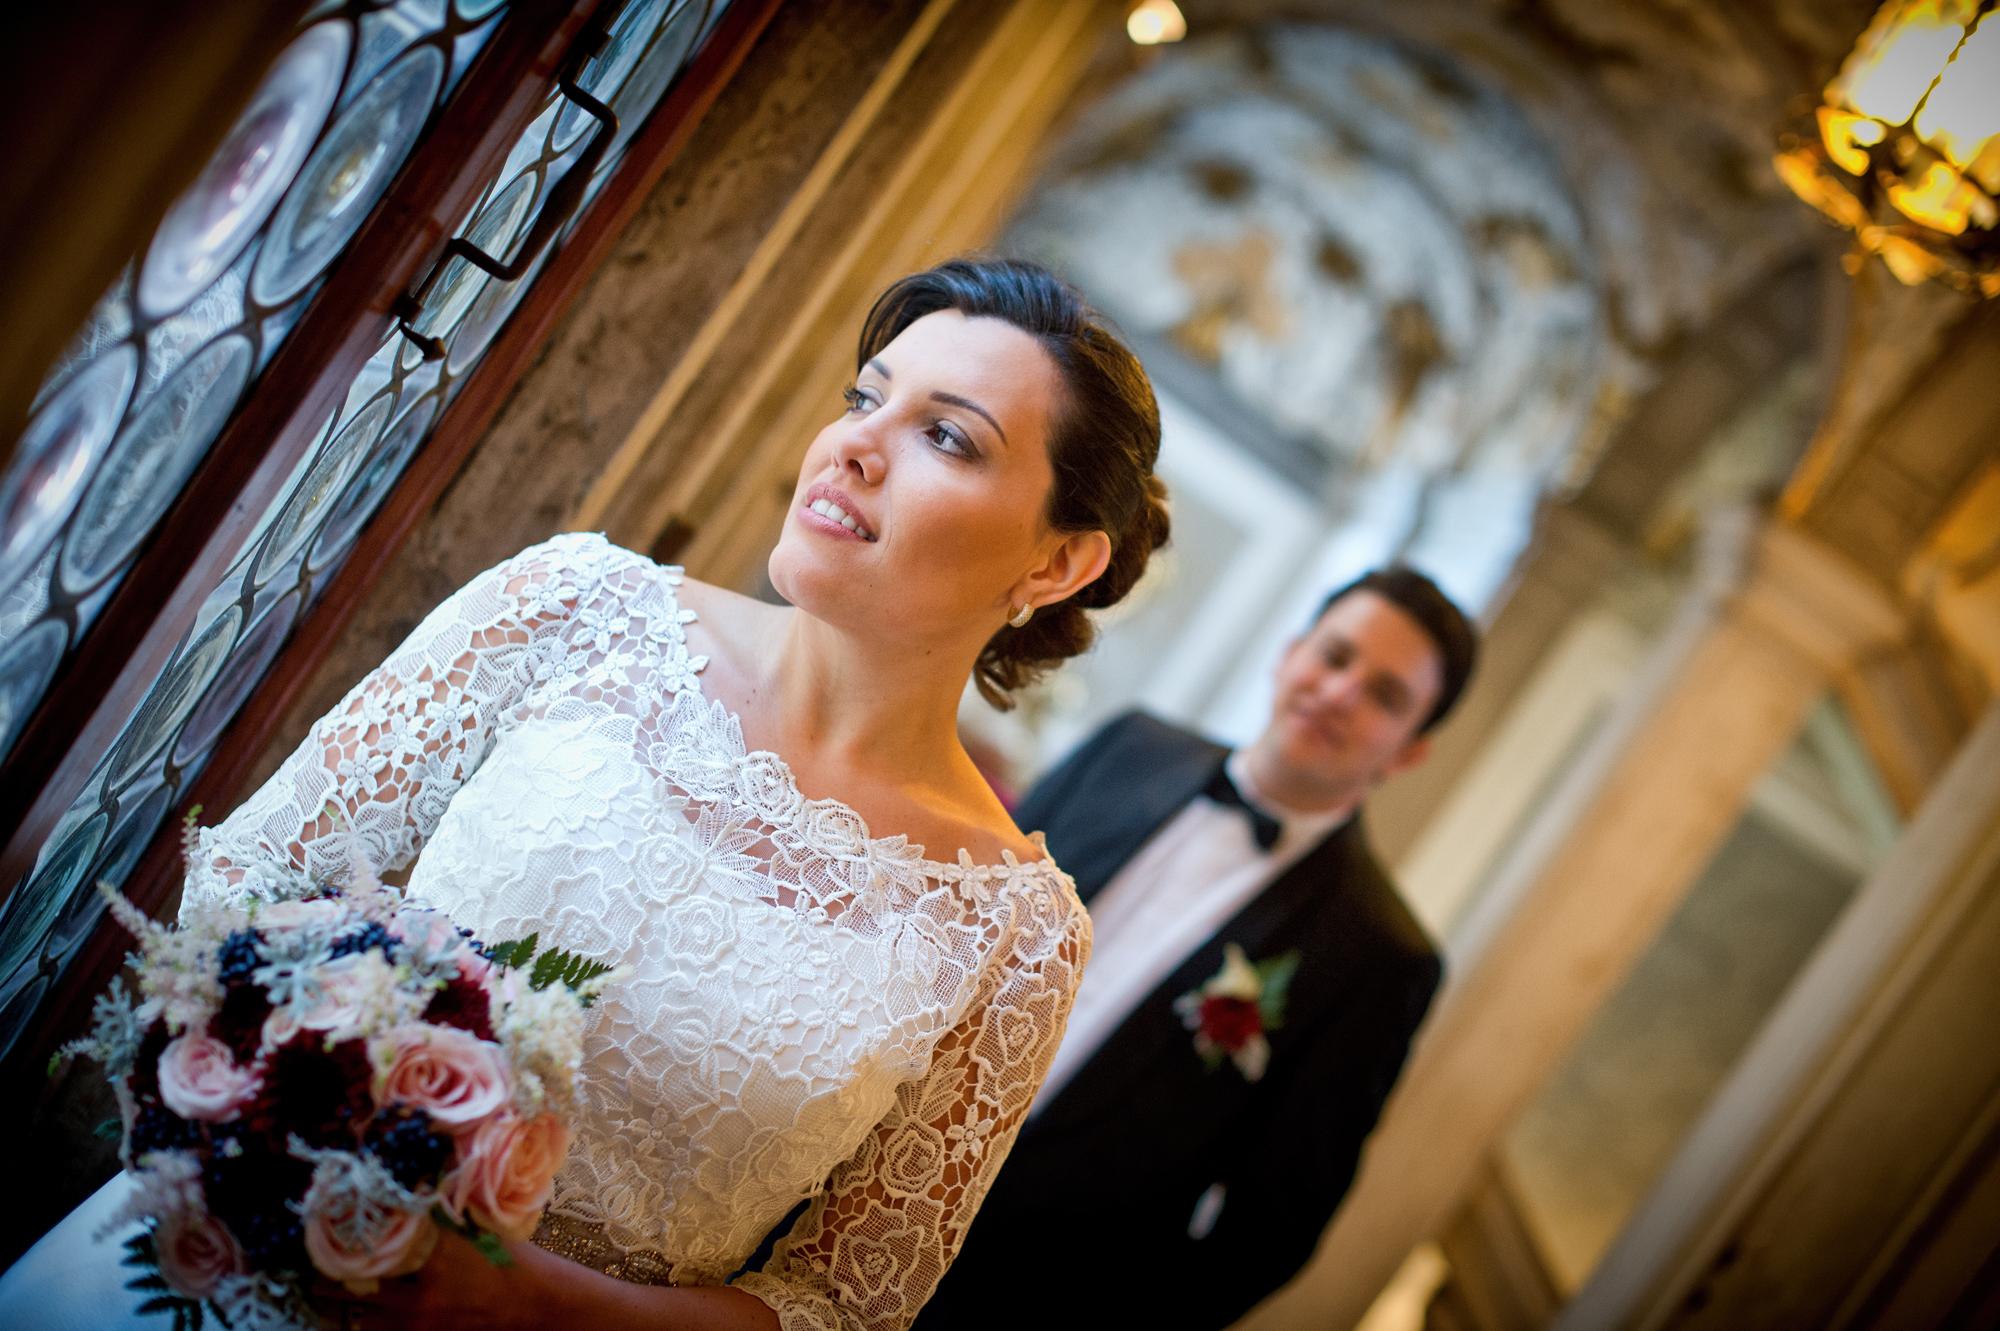 venezia matrimonio simbolico fotografia carmini laure jacquemin fotografo (51)